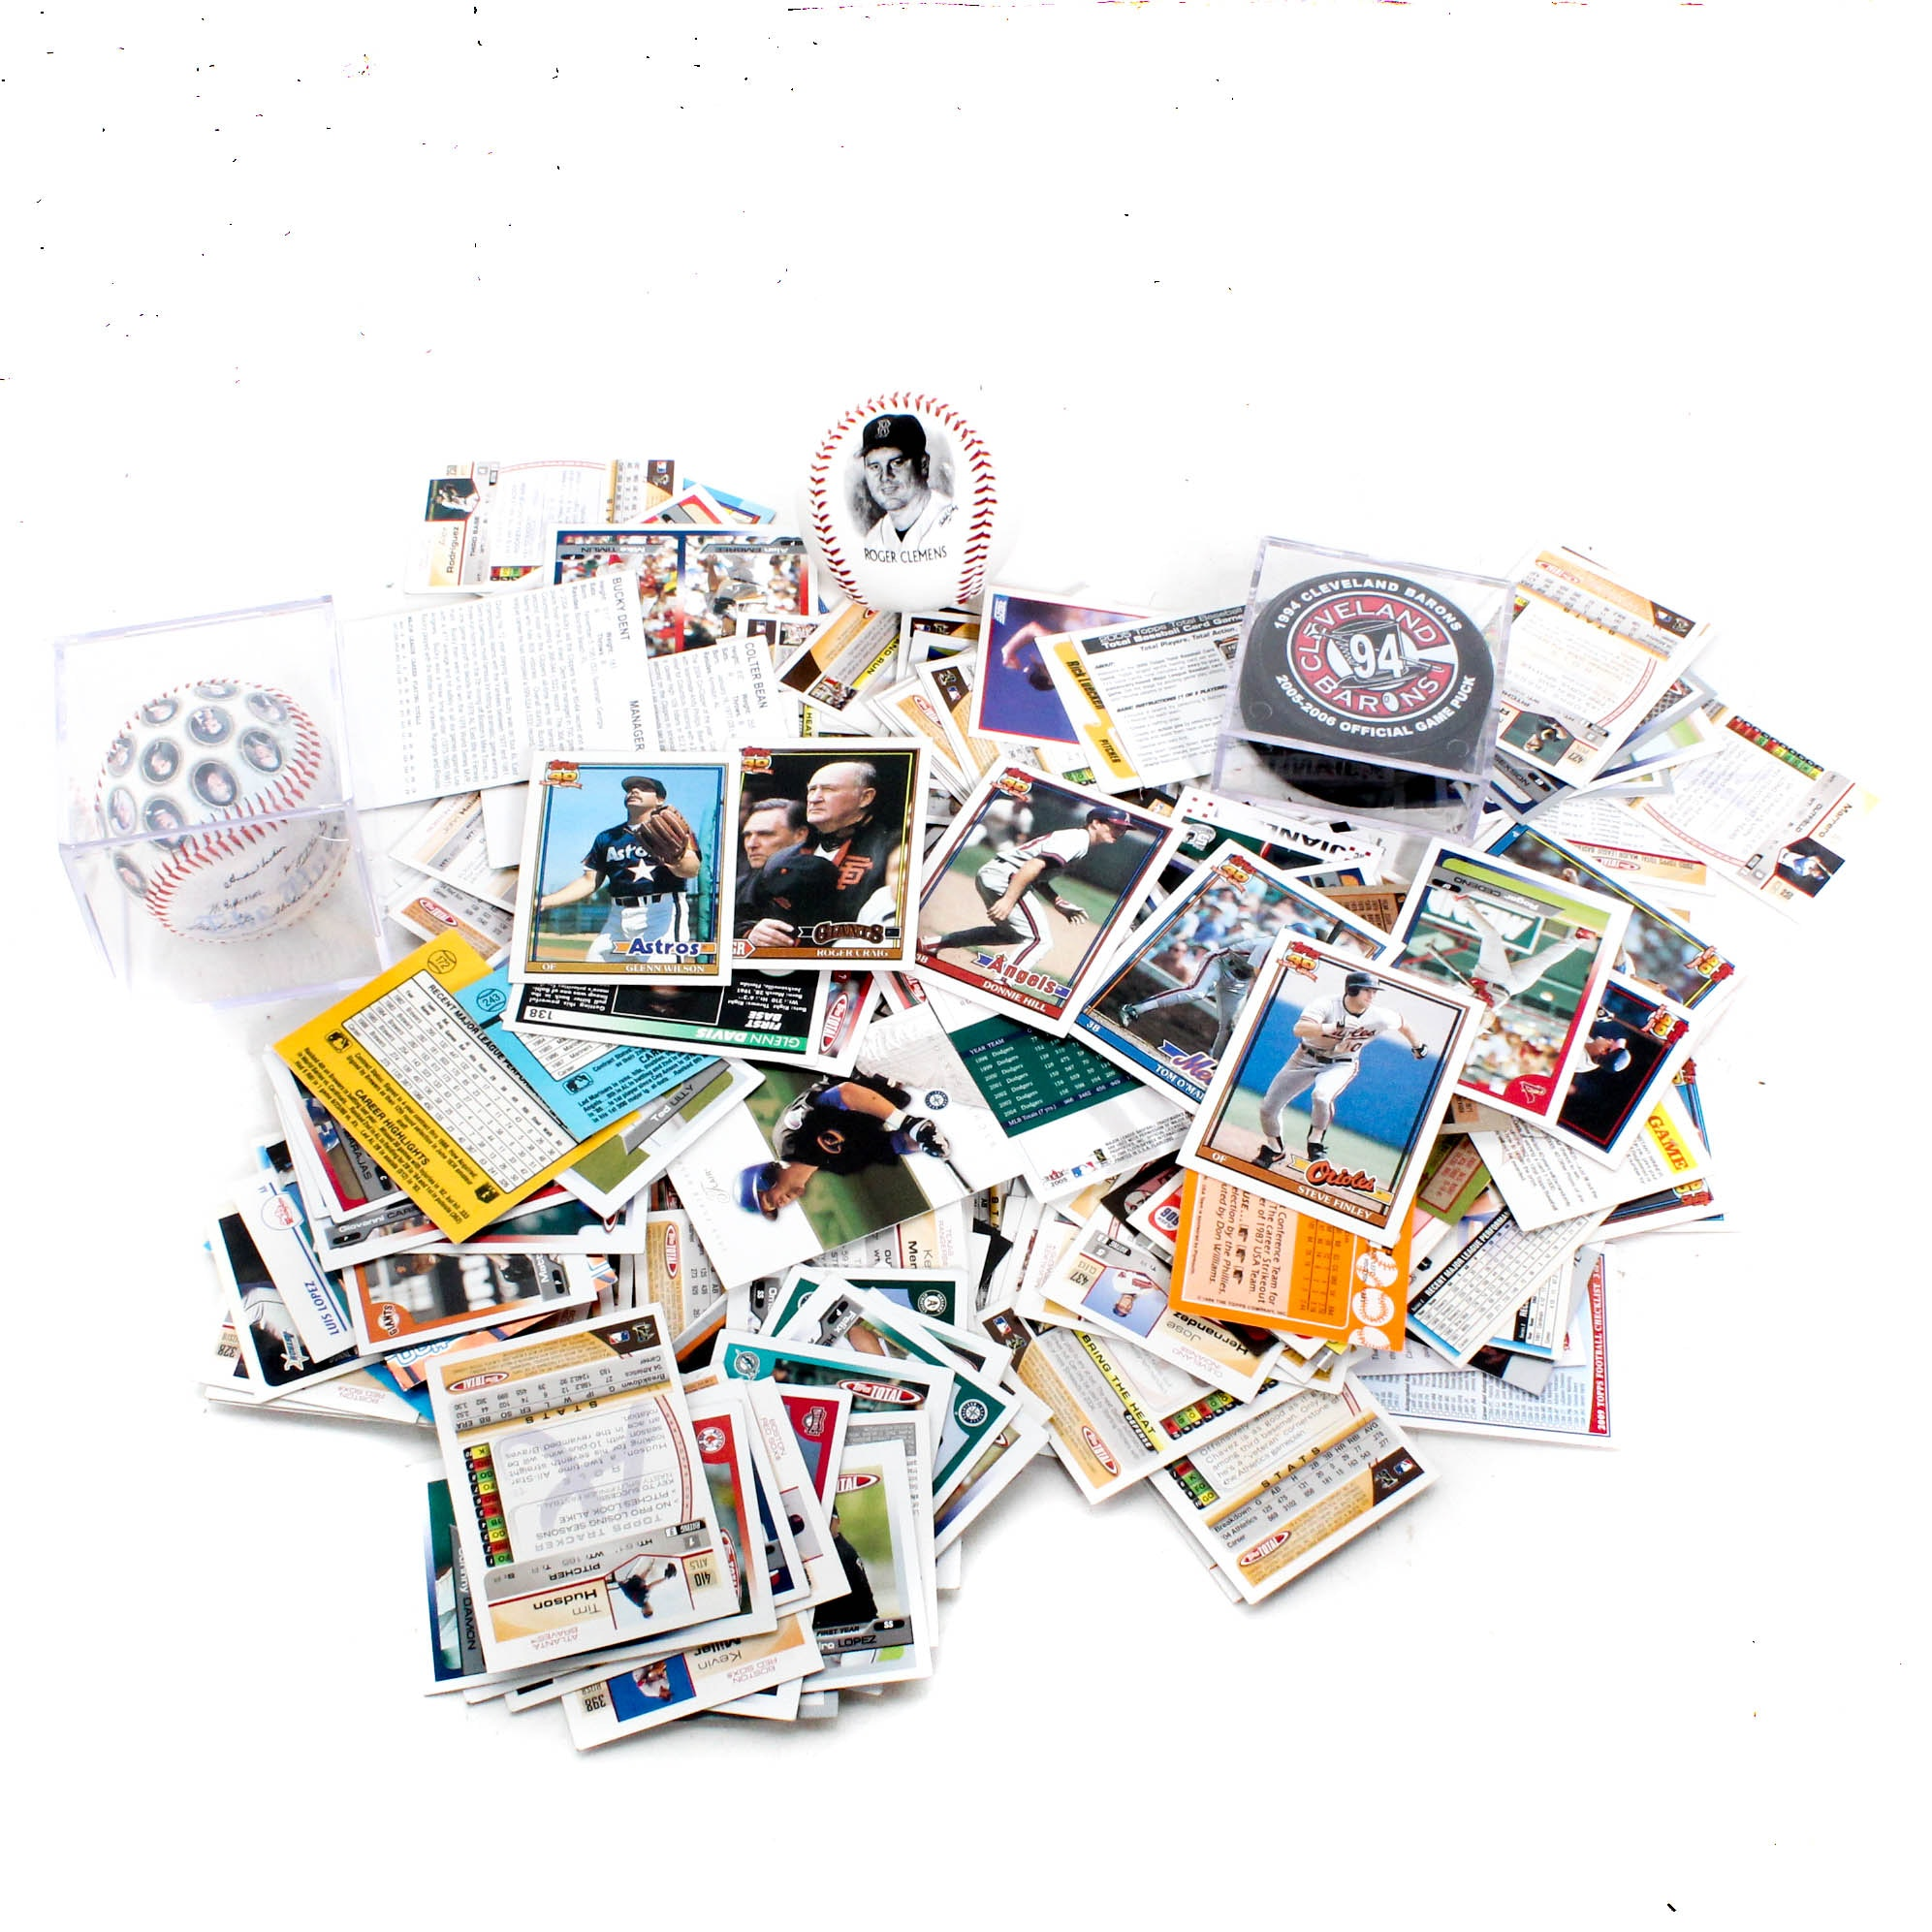 Baseball, Football, and Basketball Trading Cards and Sports Memorabilia